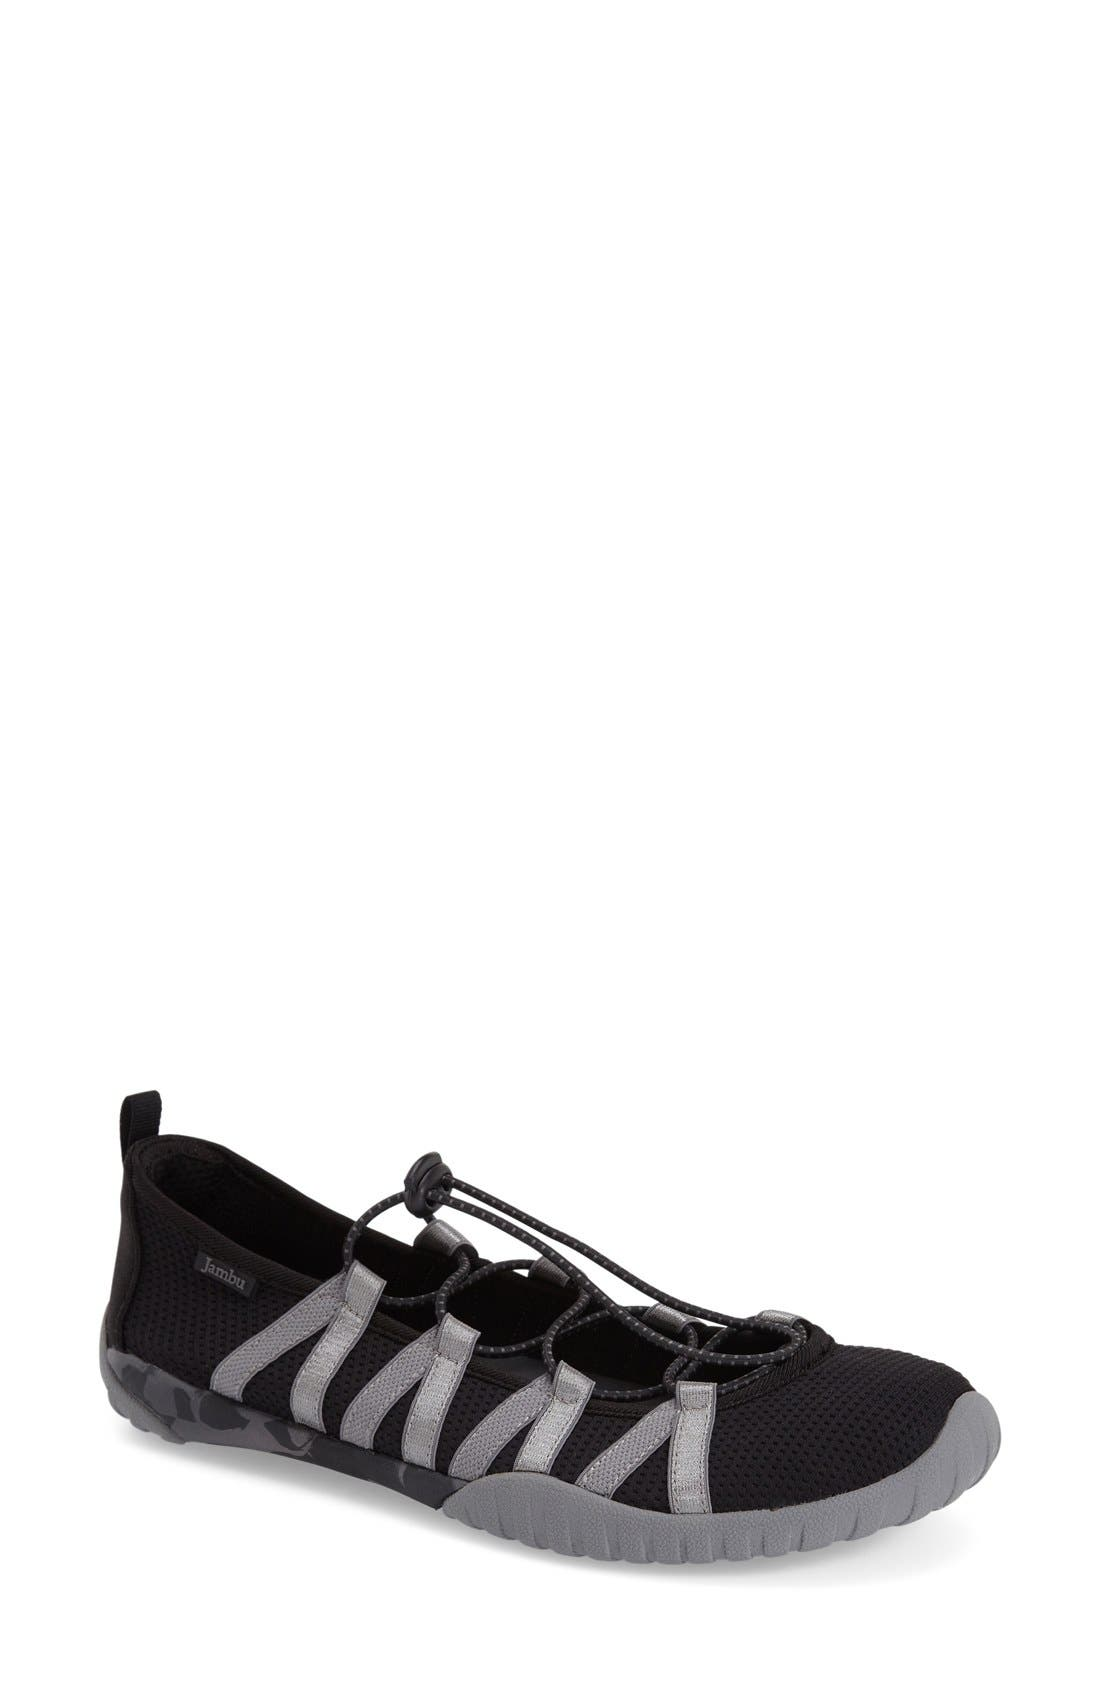 'Manuka' Water Friendly Slip-On Sneaker,                         Main,                         color,